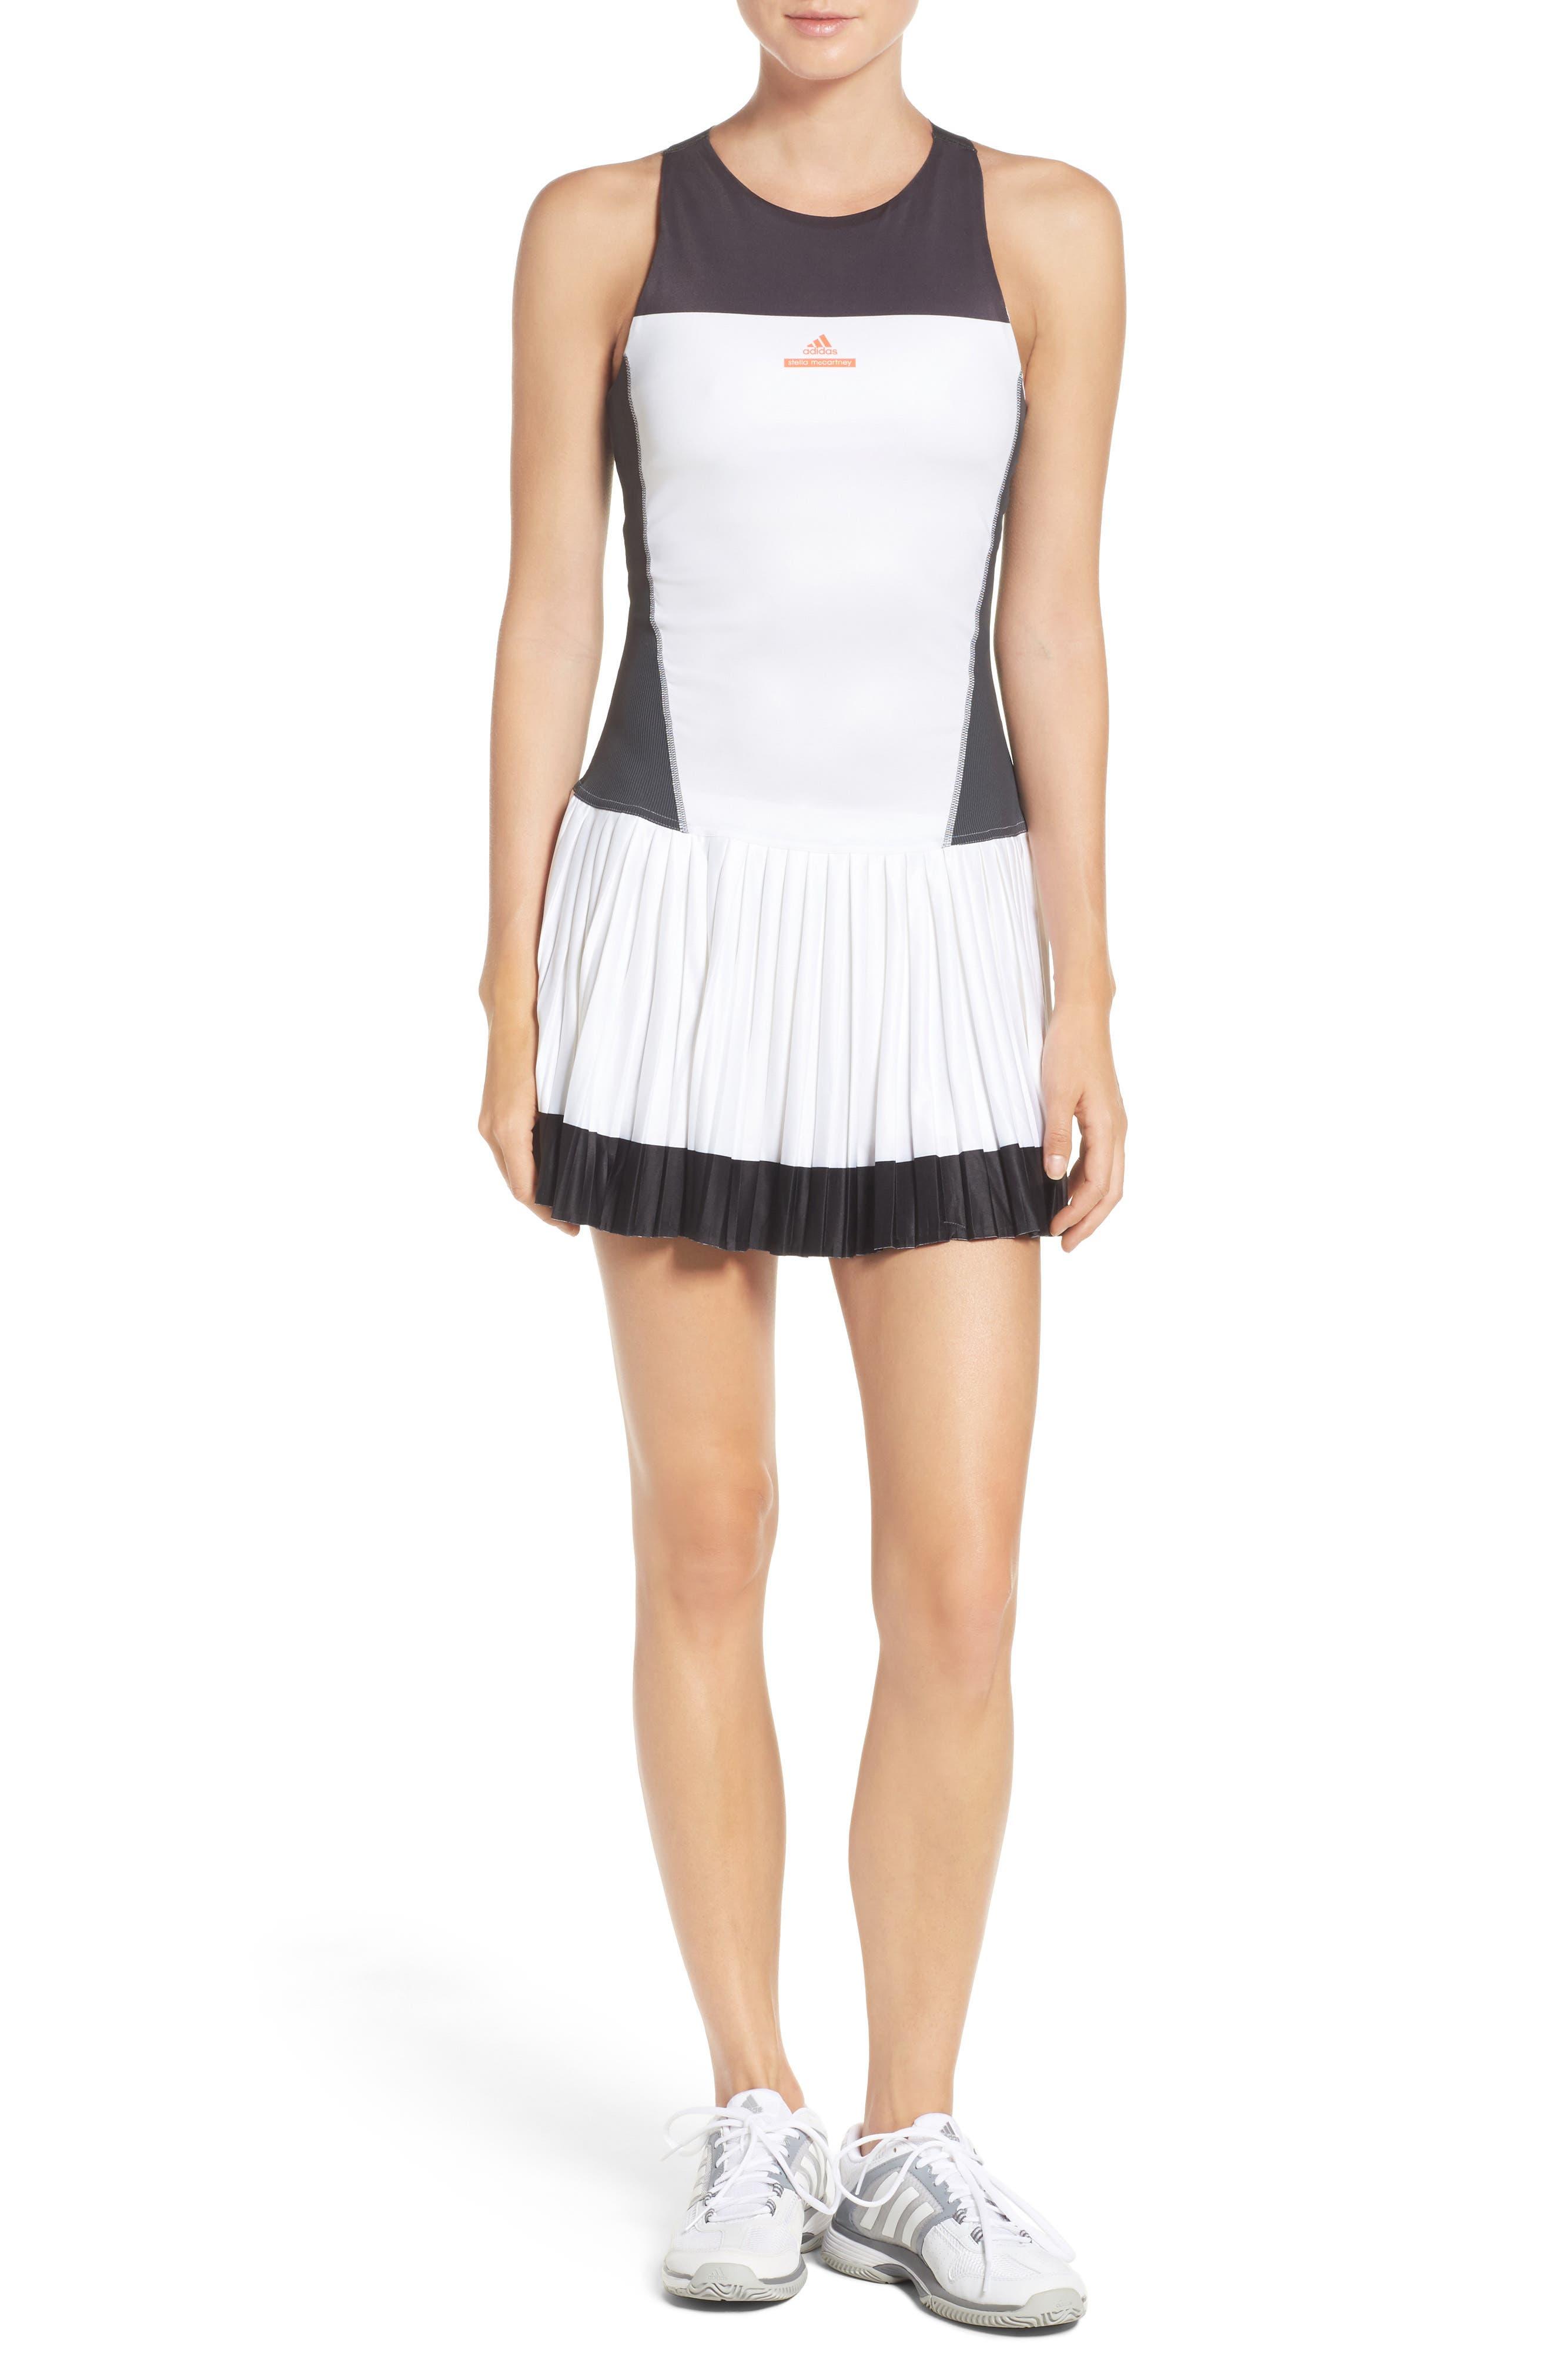 Main Image - adidas by Stella McCartney Barricade Tennis Dress & Shorts Set